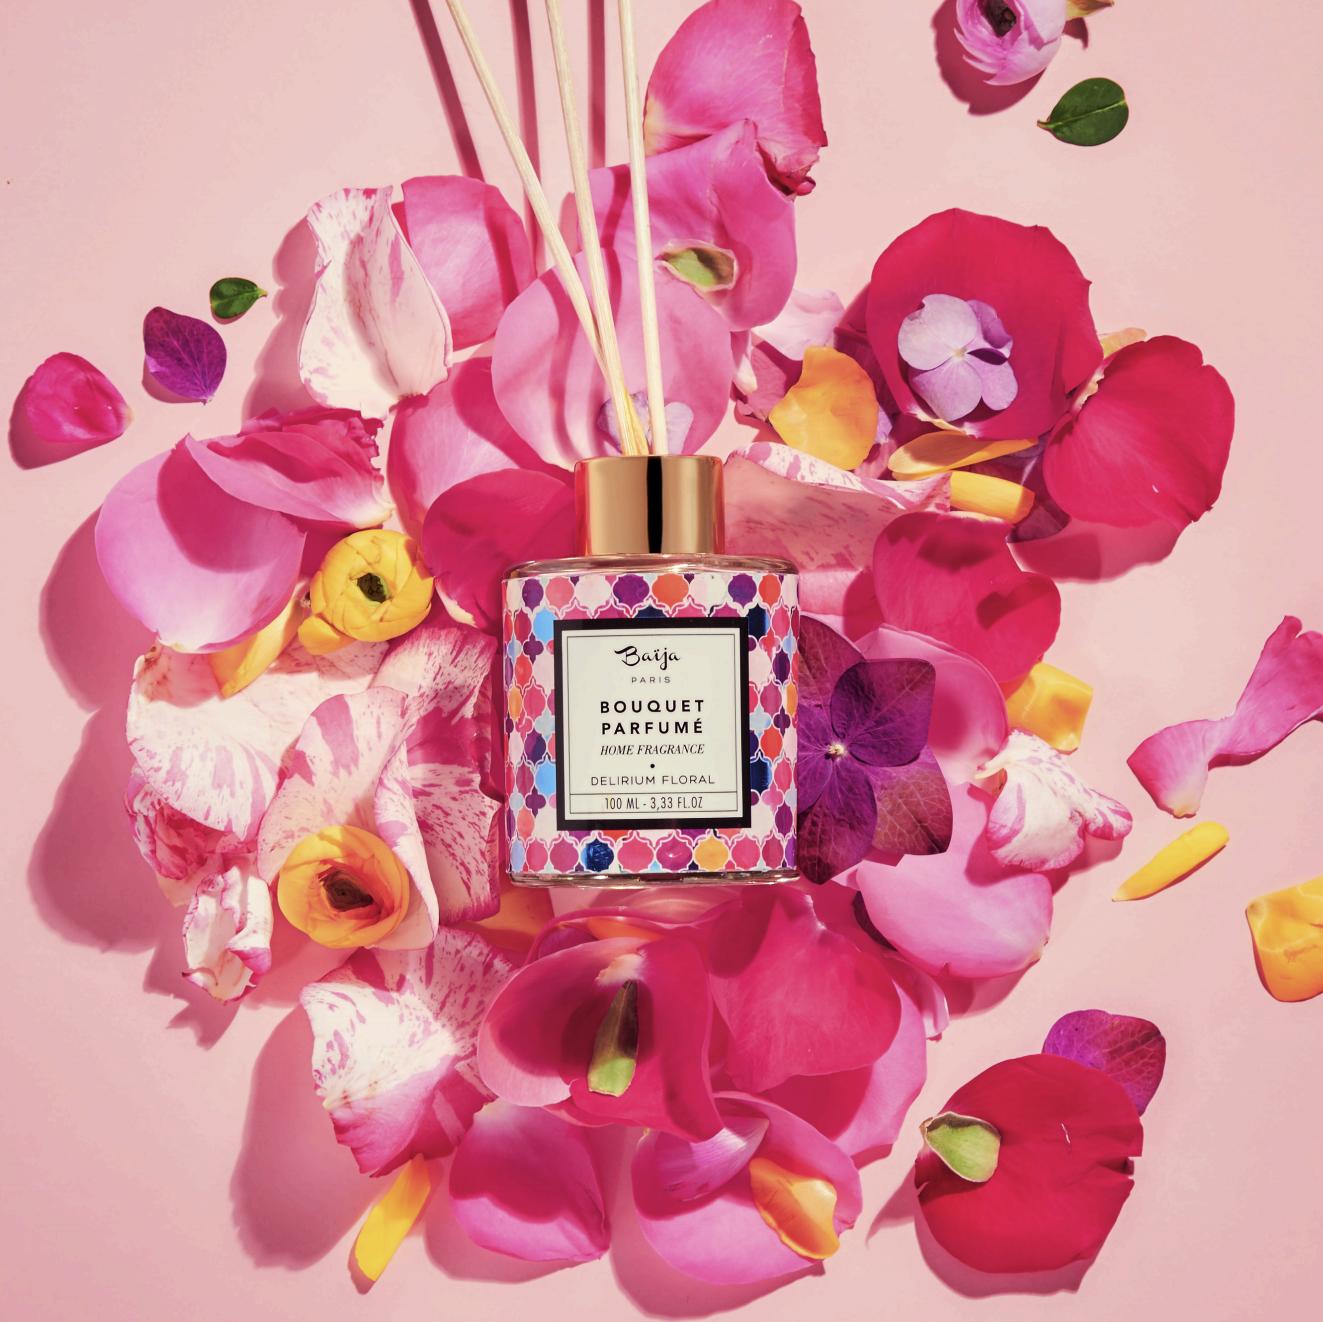 Bouquet parfumée, produit de Baija